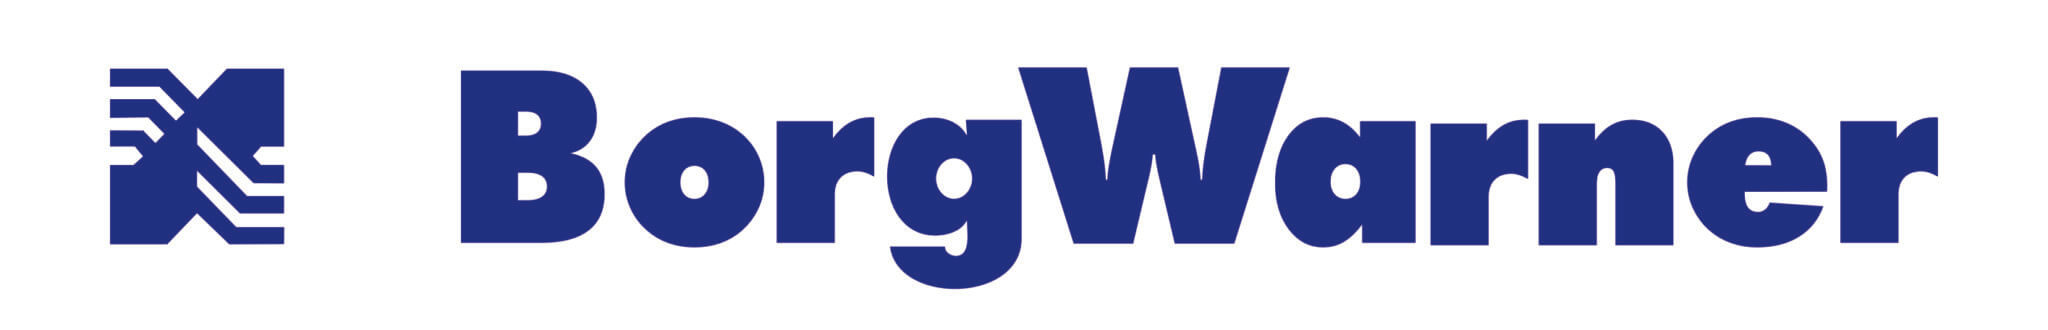 BorgWarner -Blue